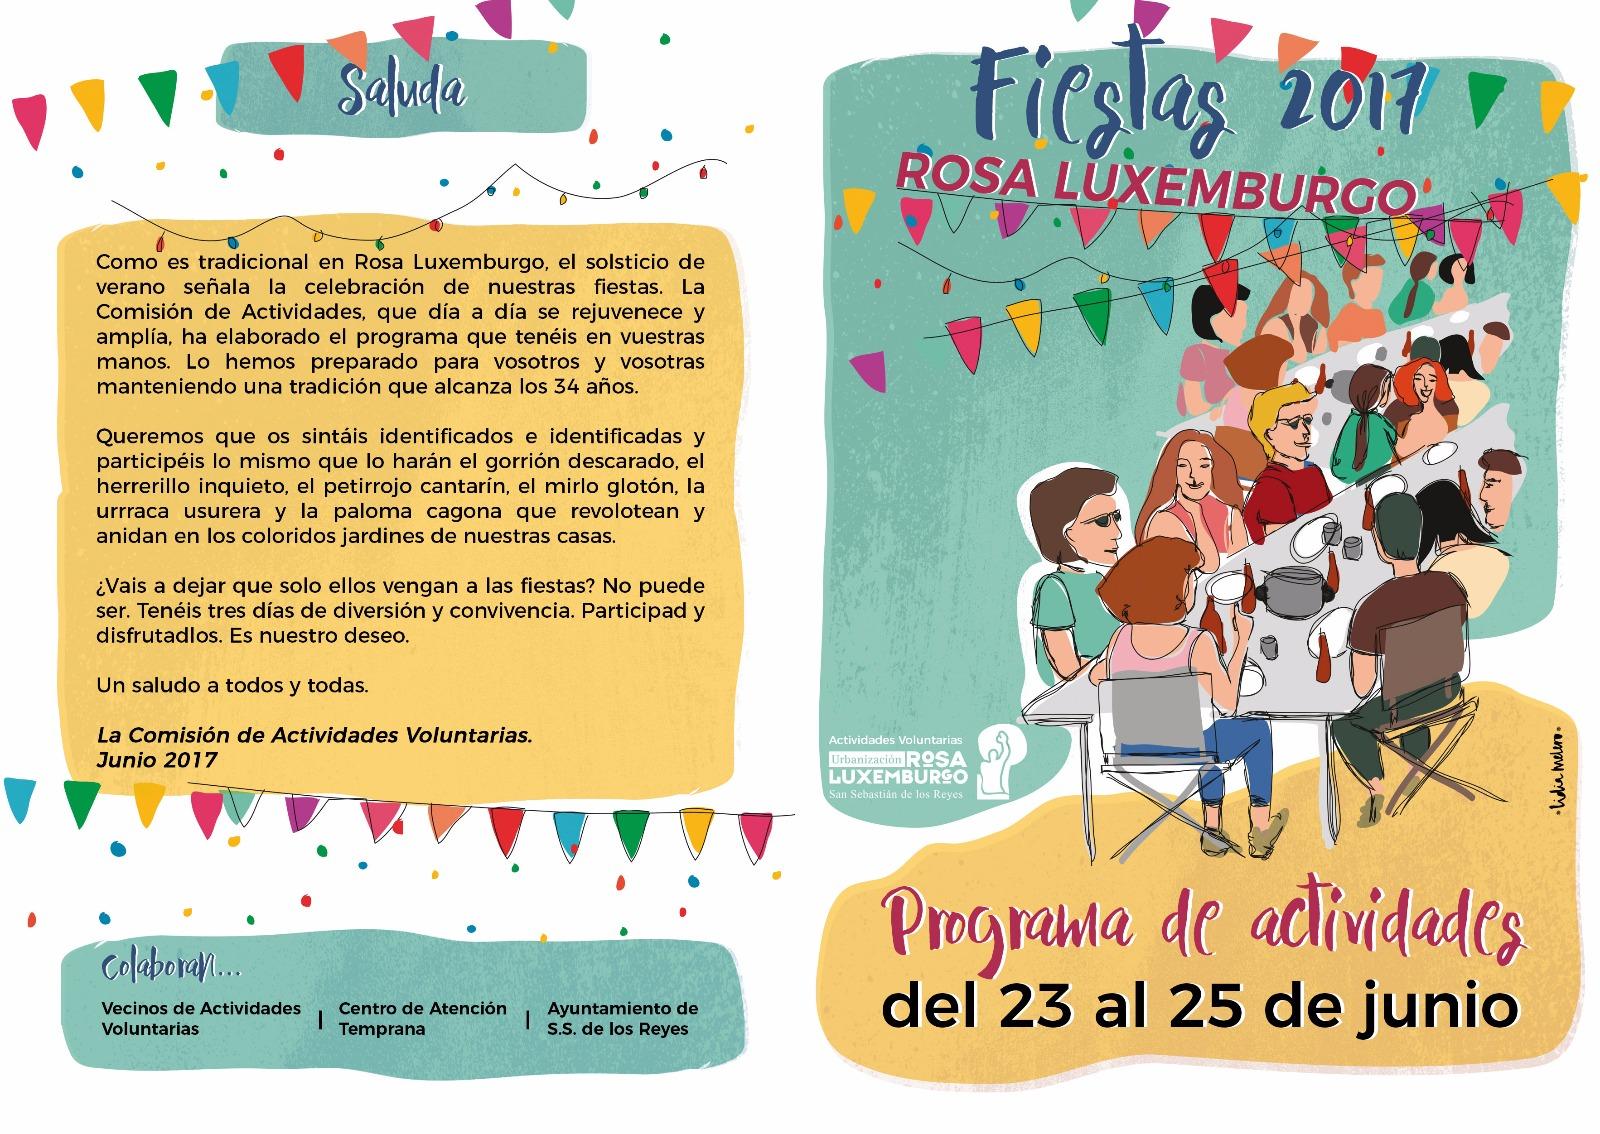 Rosa Luxemburgo San Sebastián De Los Reyes Programa De Fiestas 2017